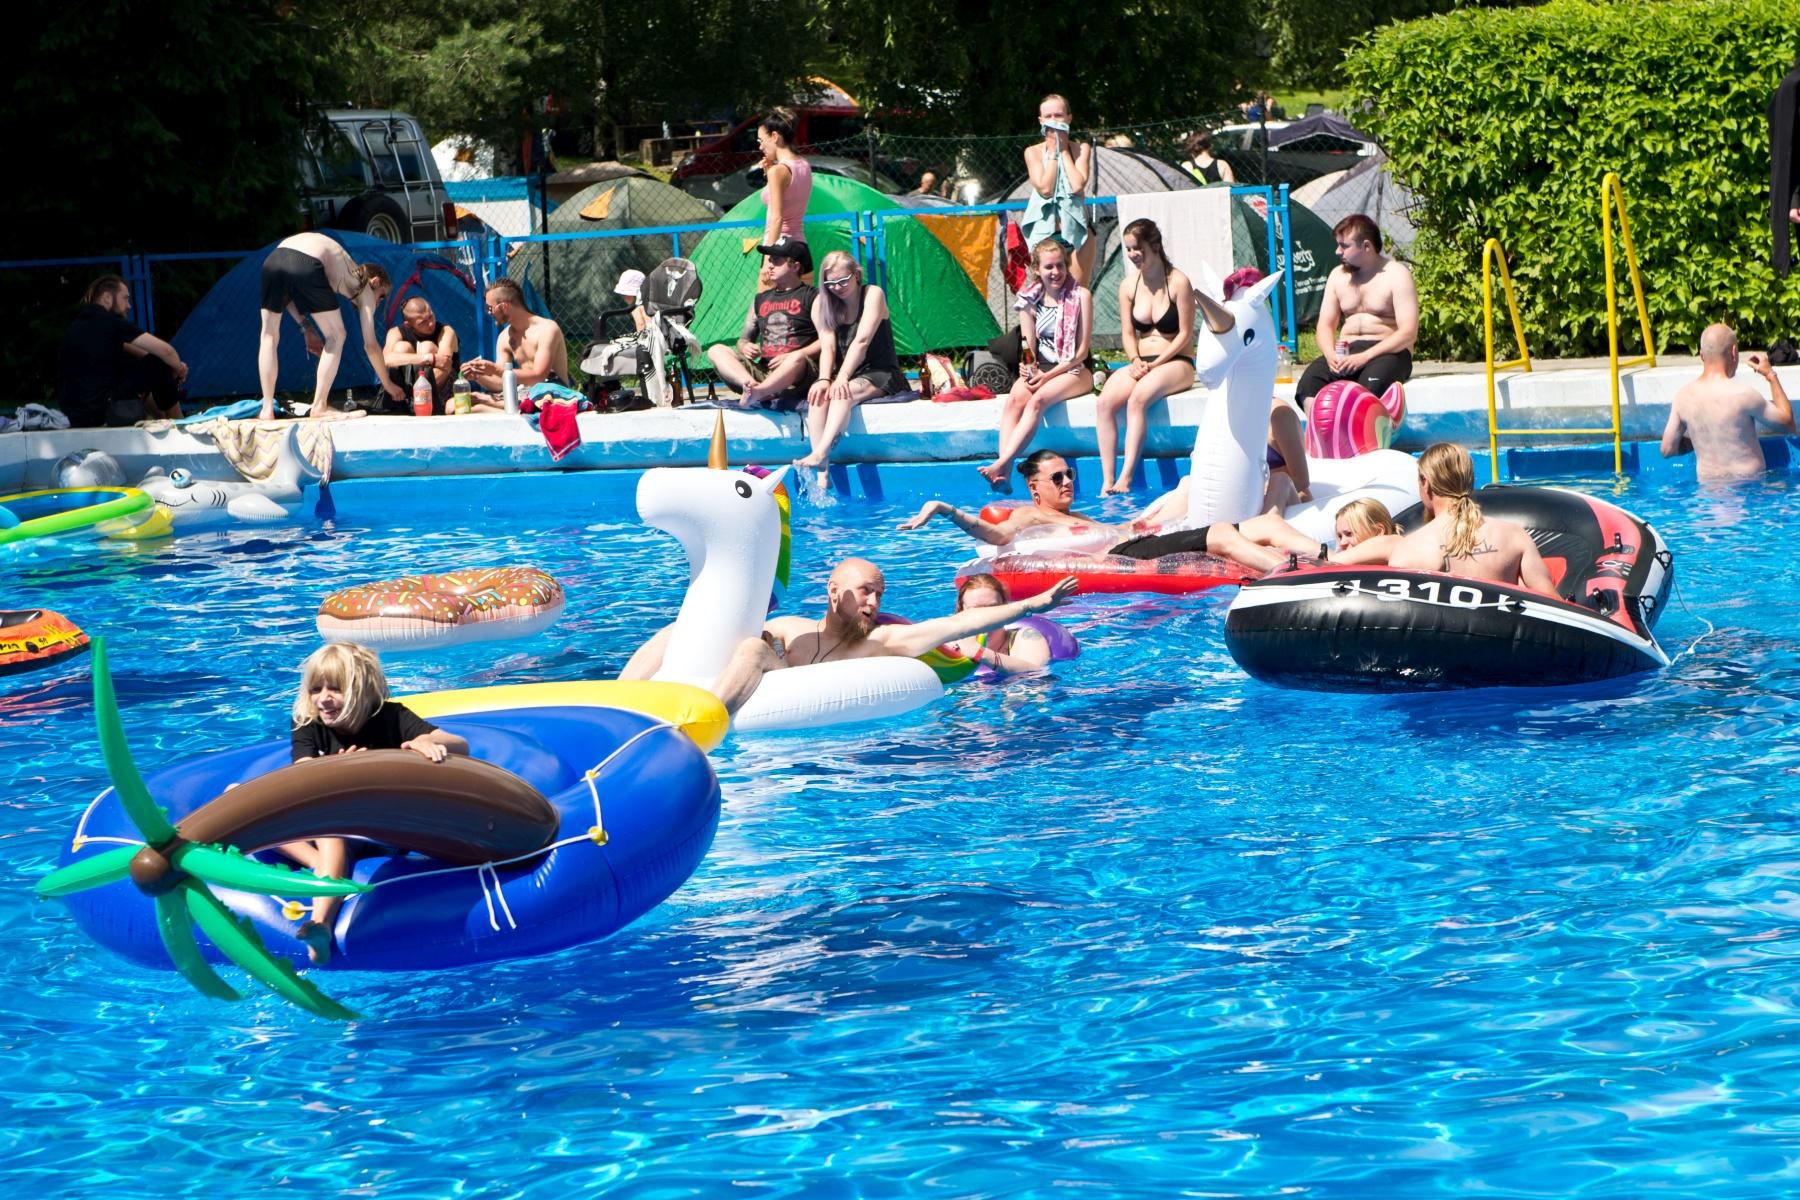 Castle Party - Pool party!